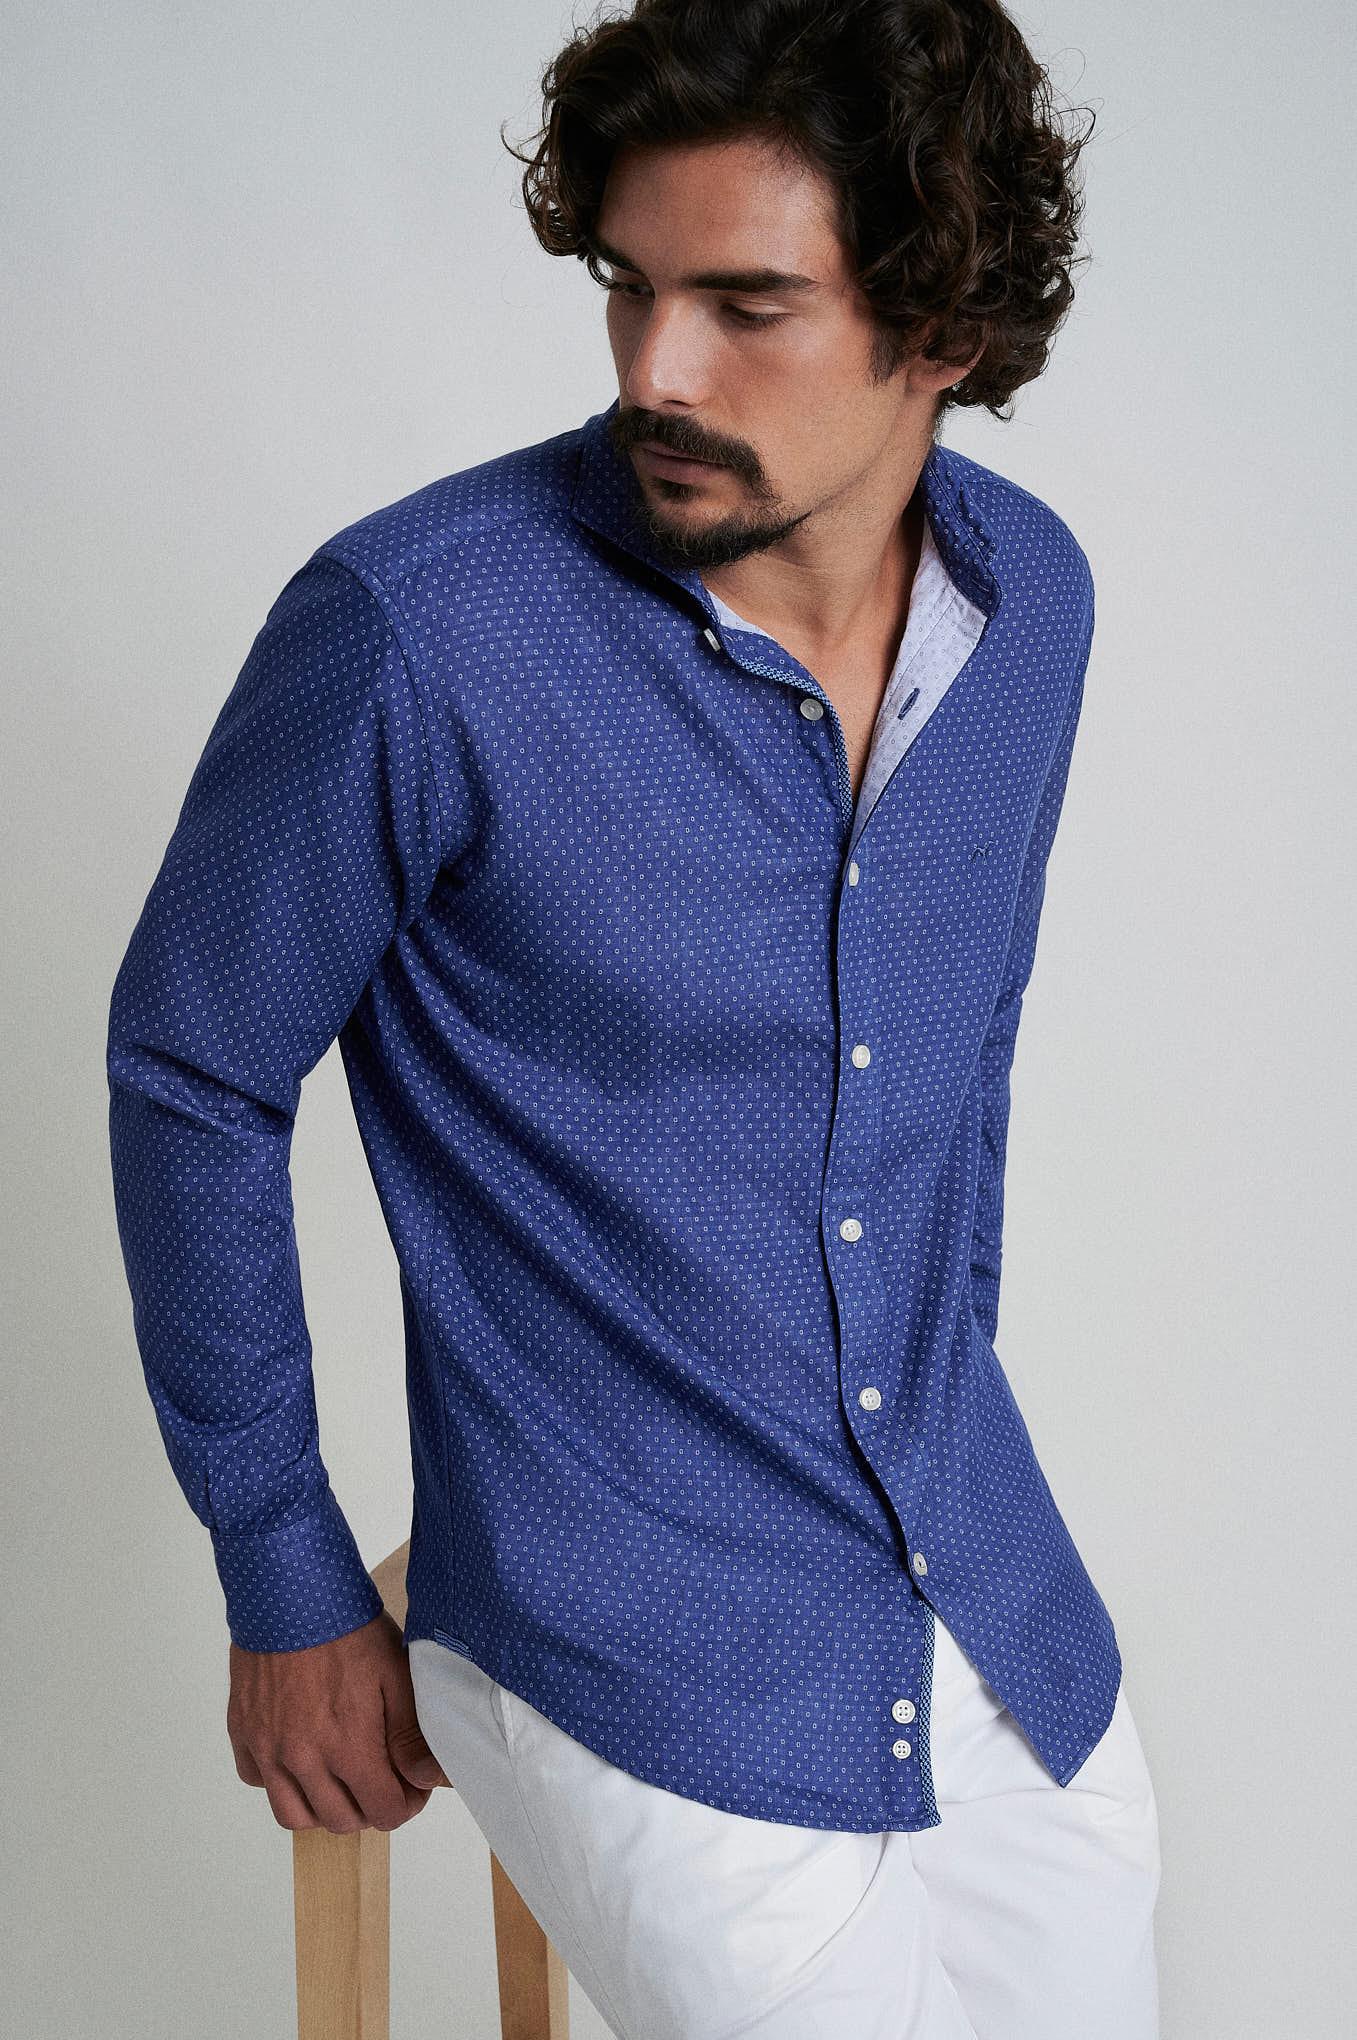 Shirt Blue Casual Man